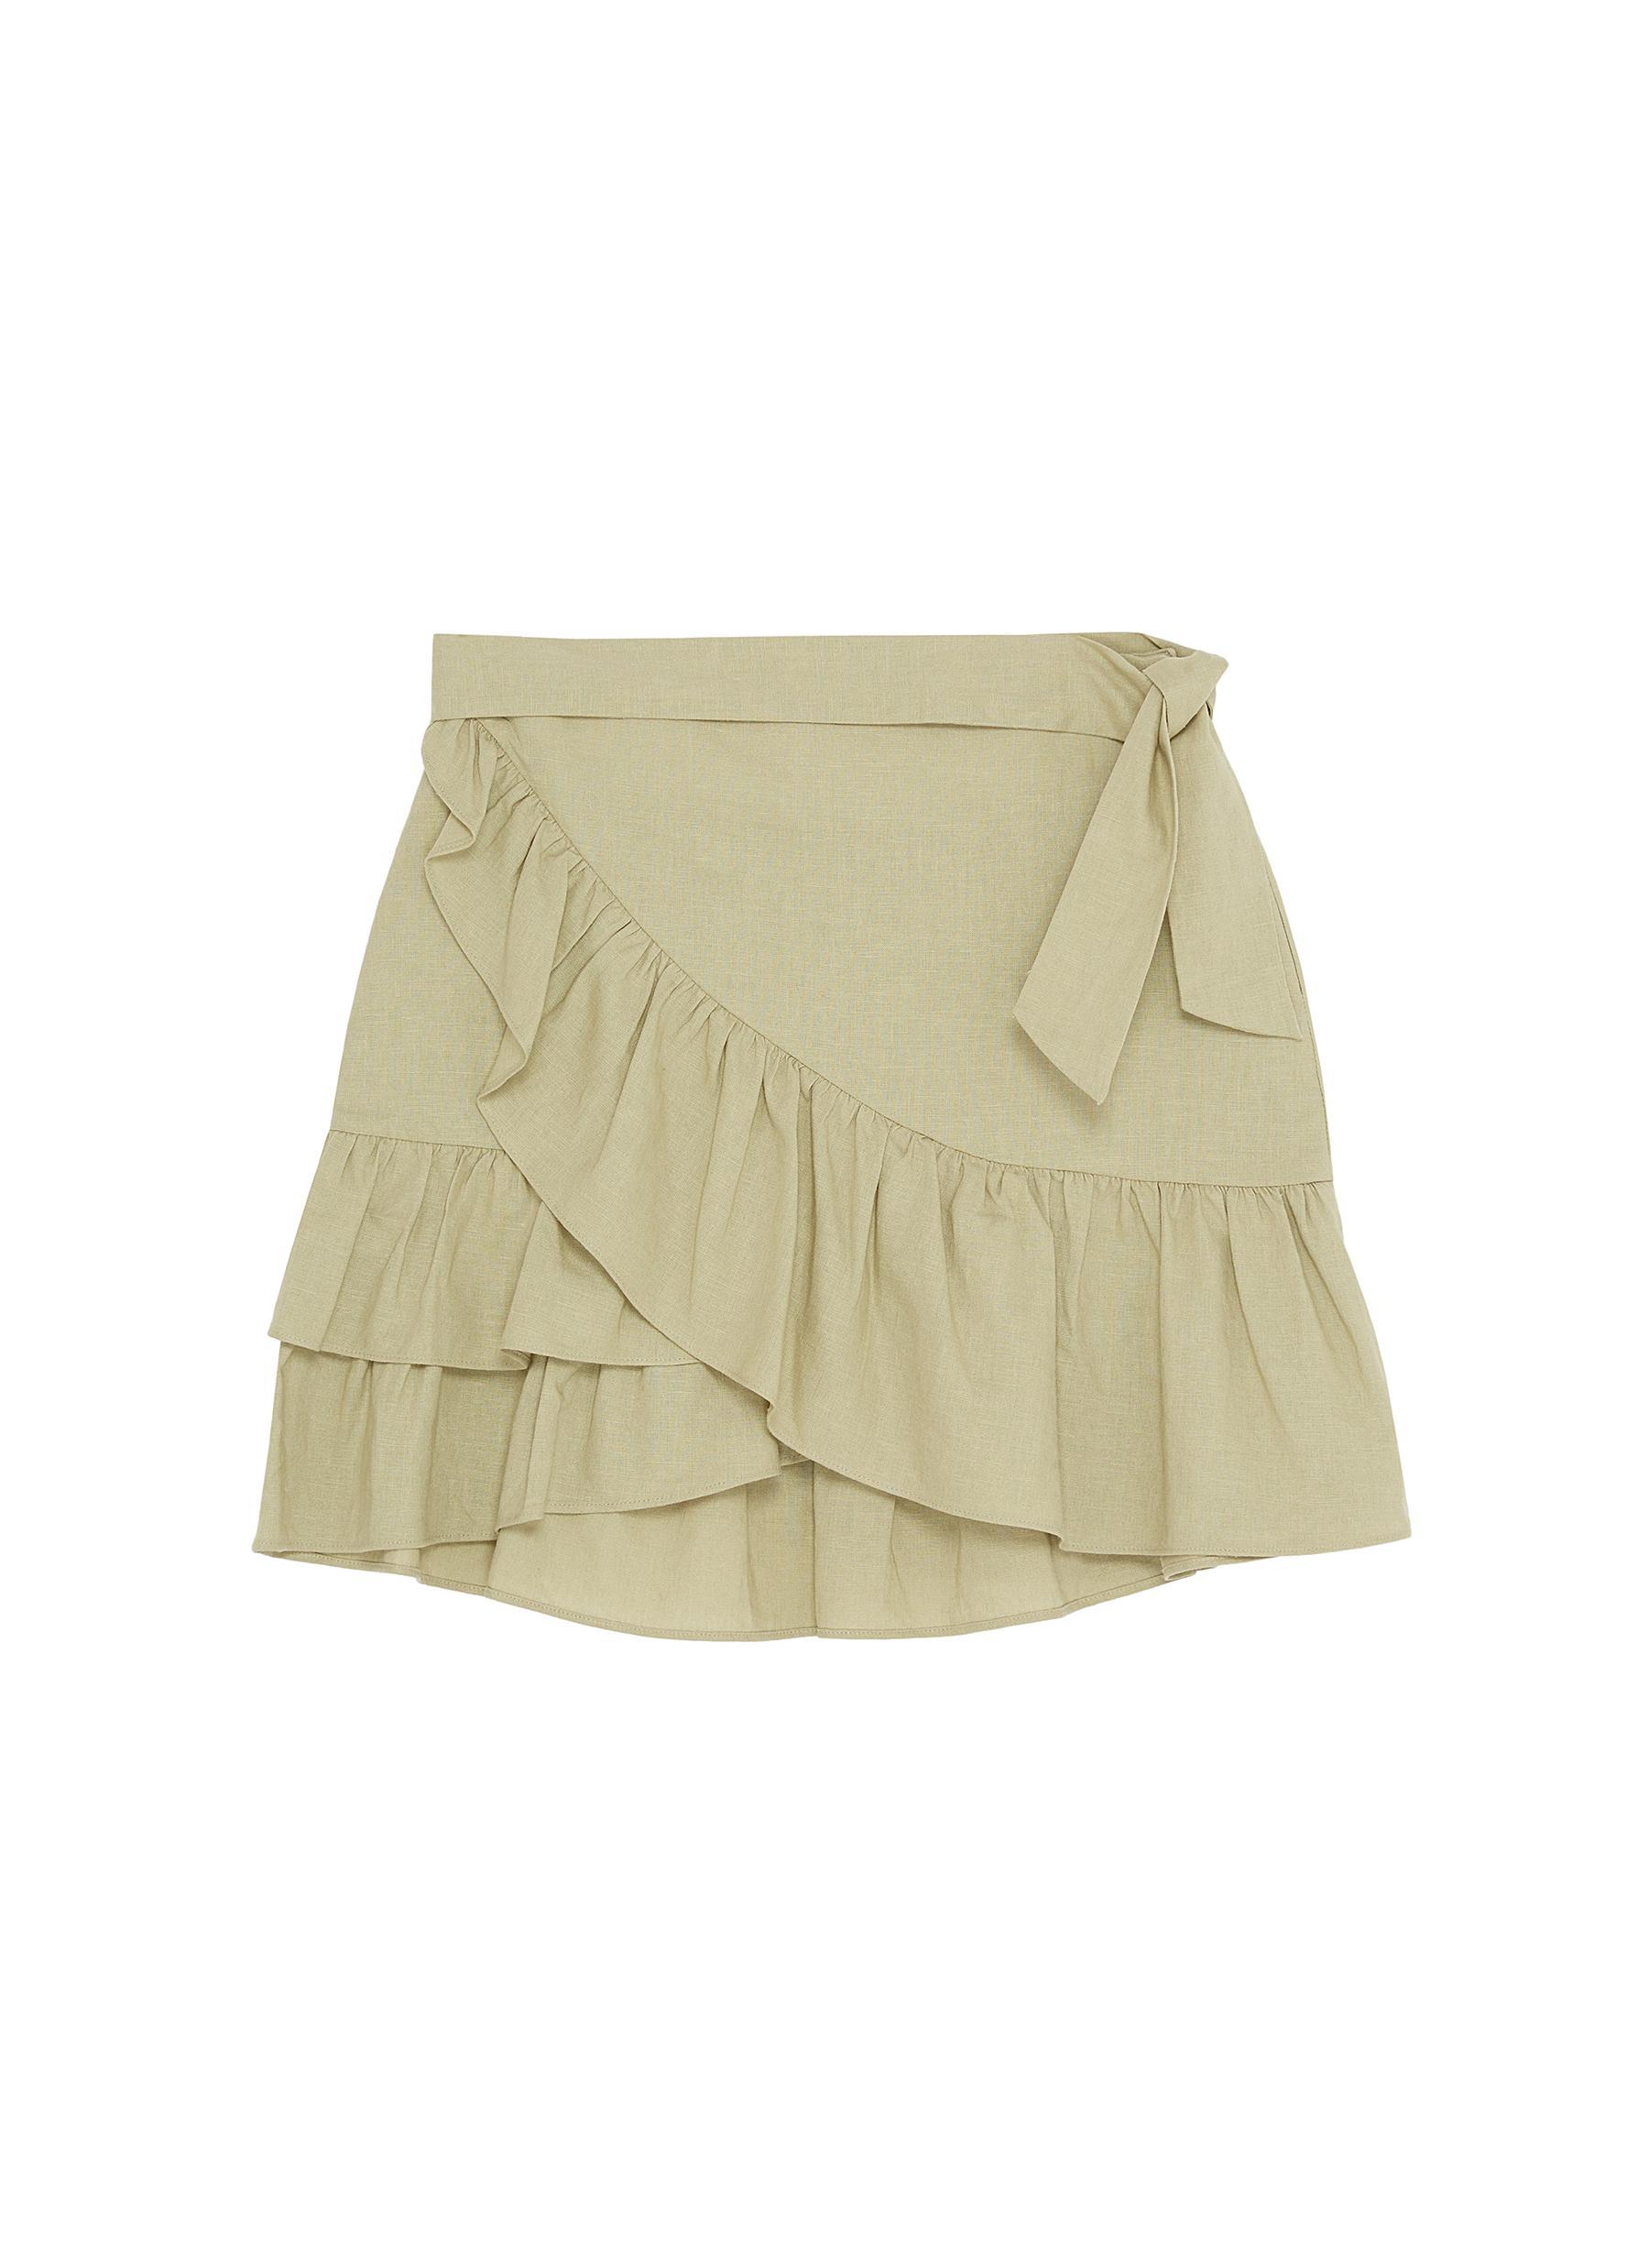 ff59775061 Main View - Click To Enlarge - TOPSHOP - Ruffle trim wrap mini skirt